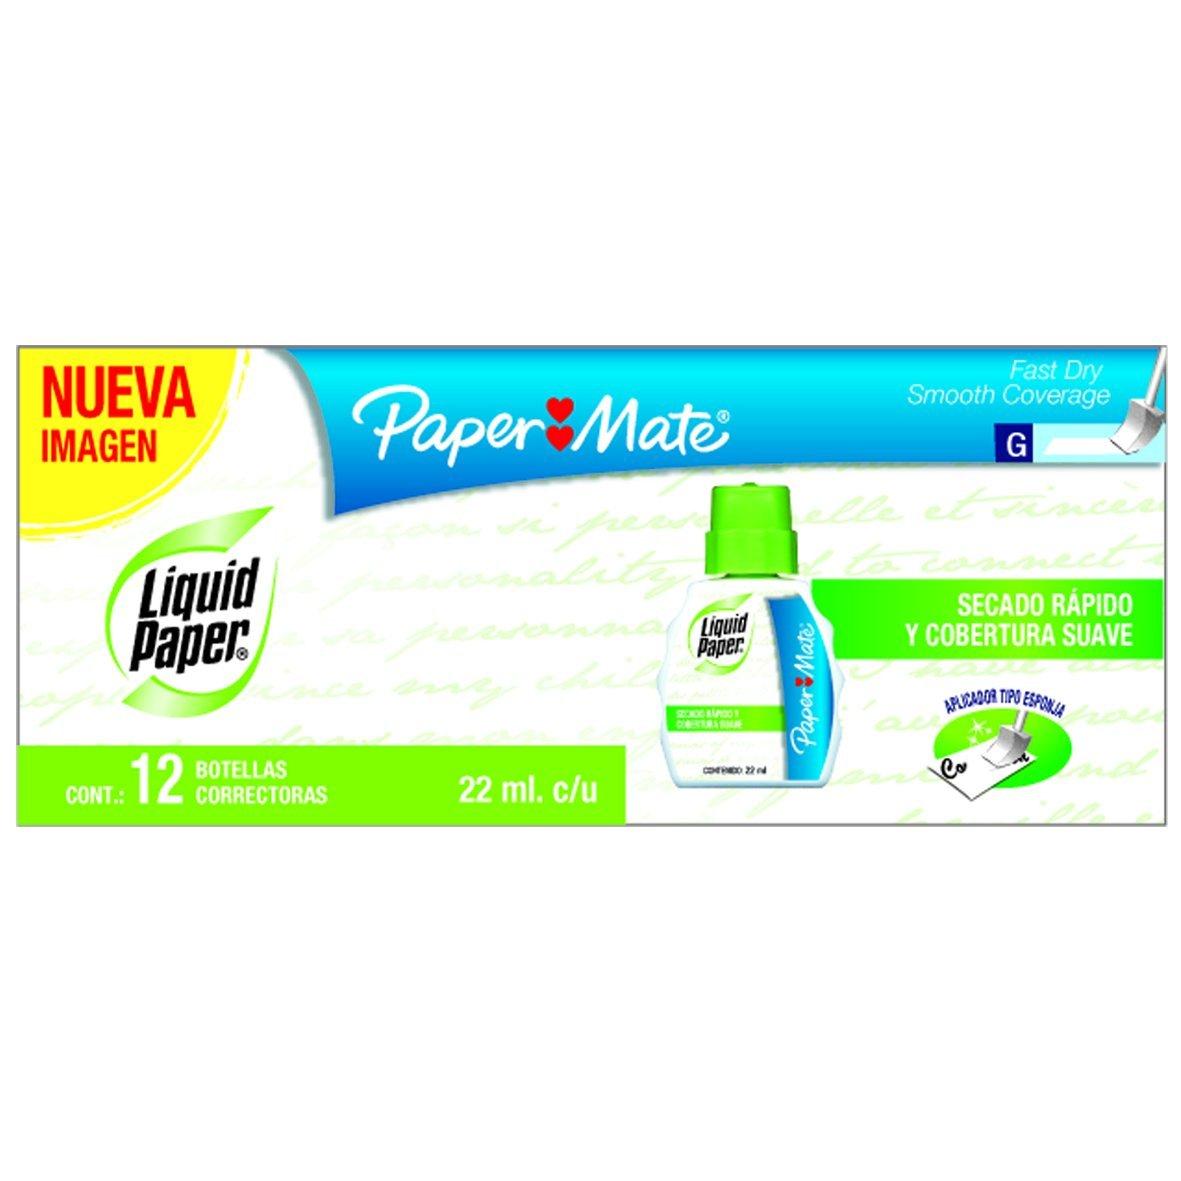 Amazon: Caja de 12 correctores Paper Mate a $35.15